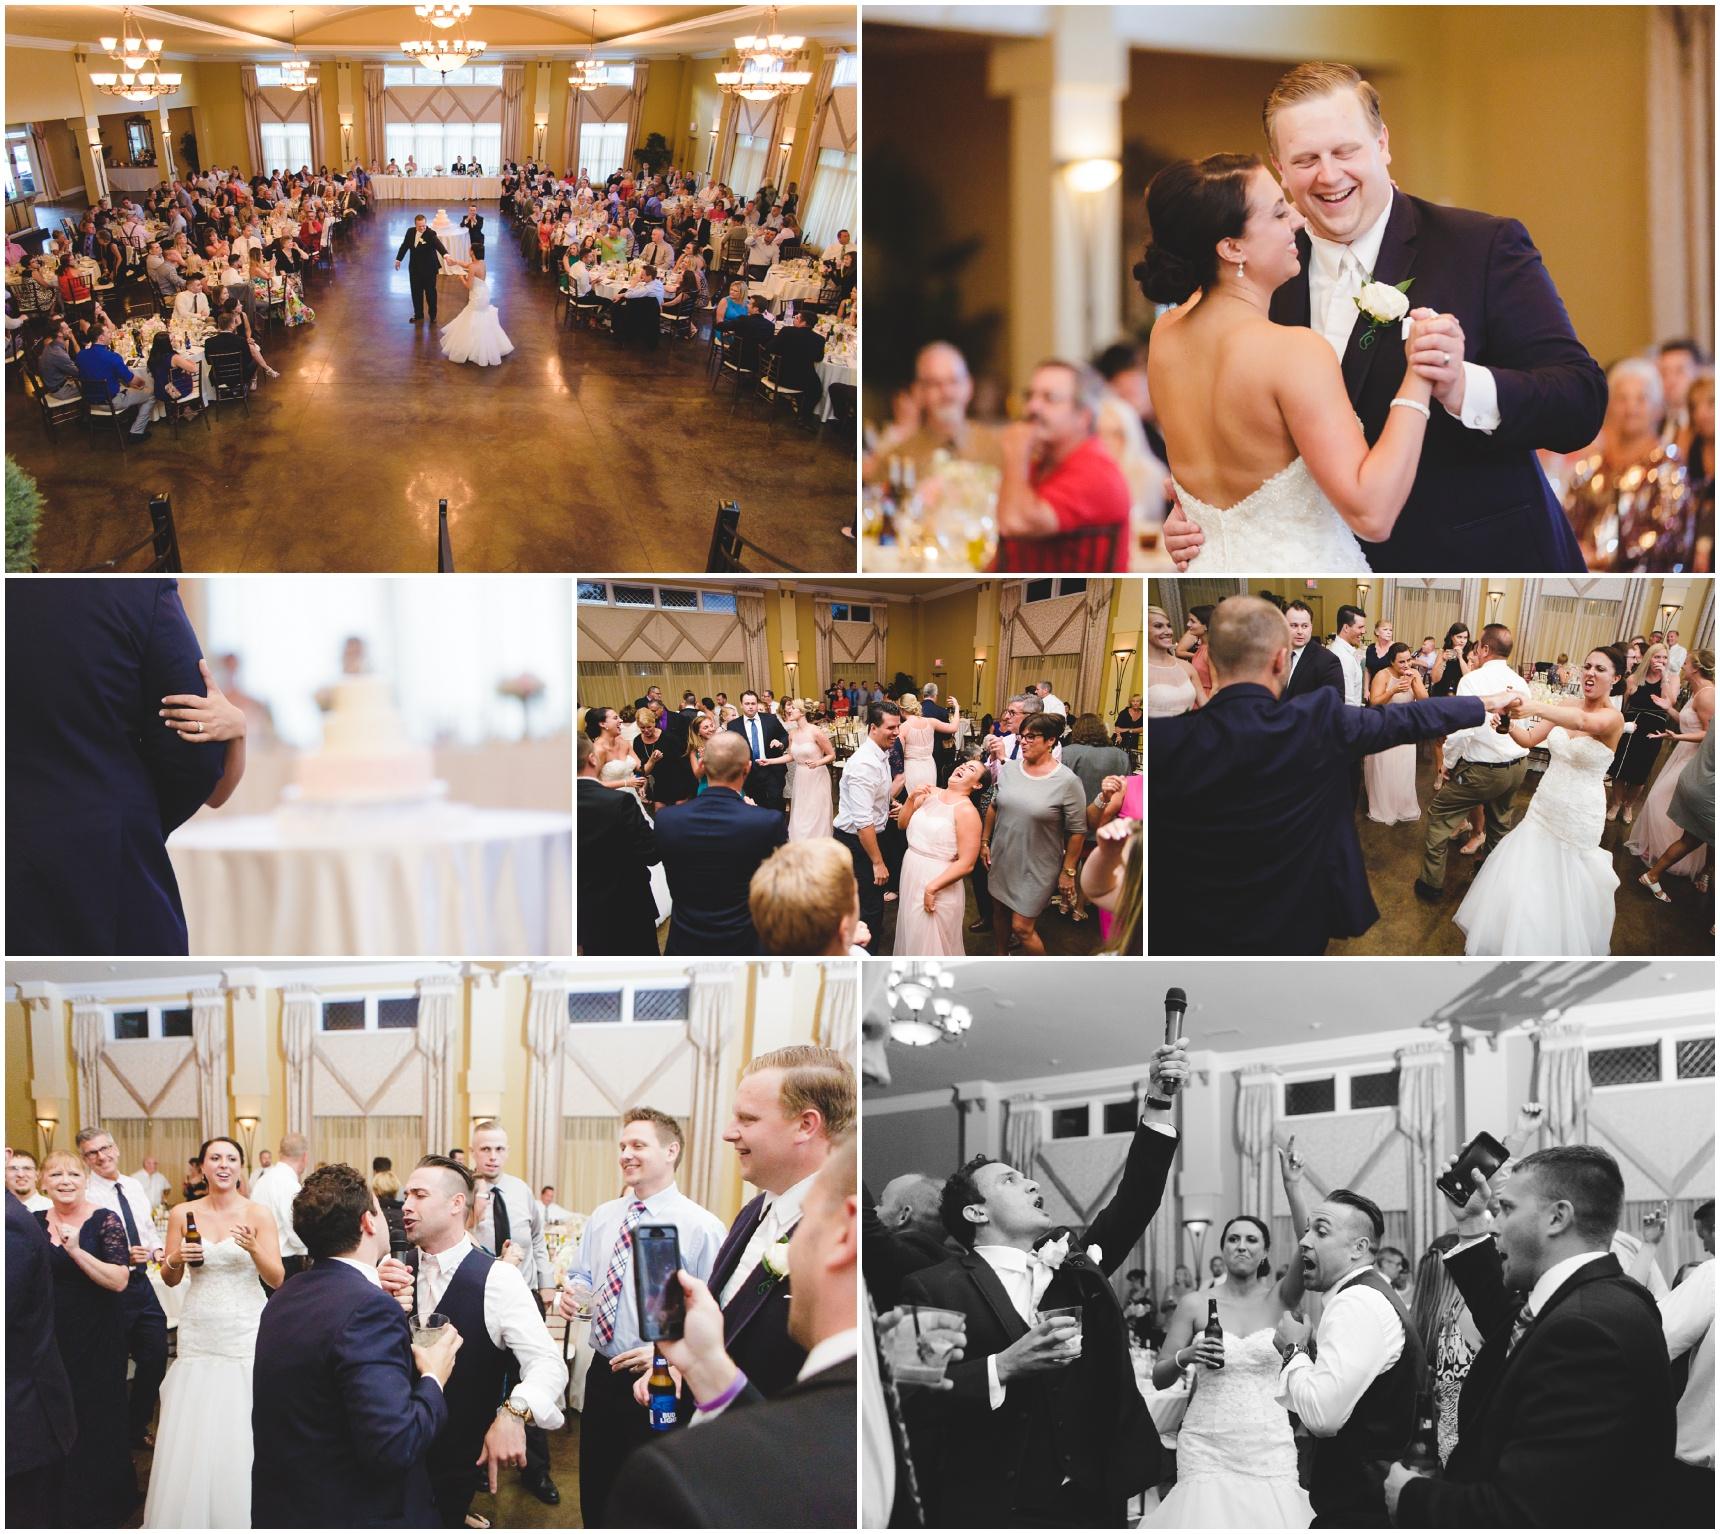 Buffalo-Wedding-Photographer_064.jpg